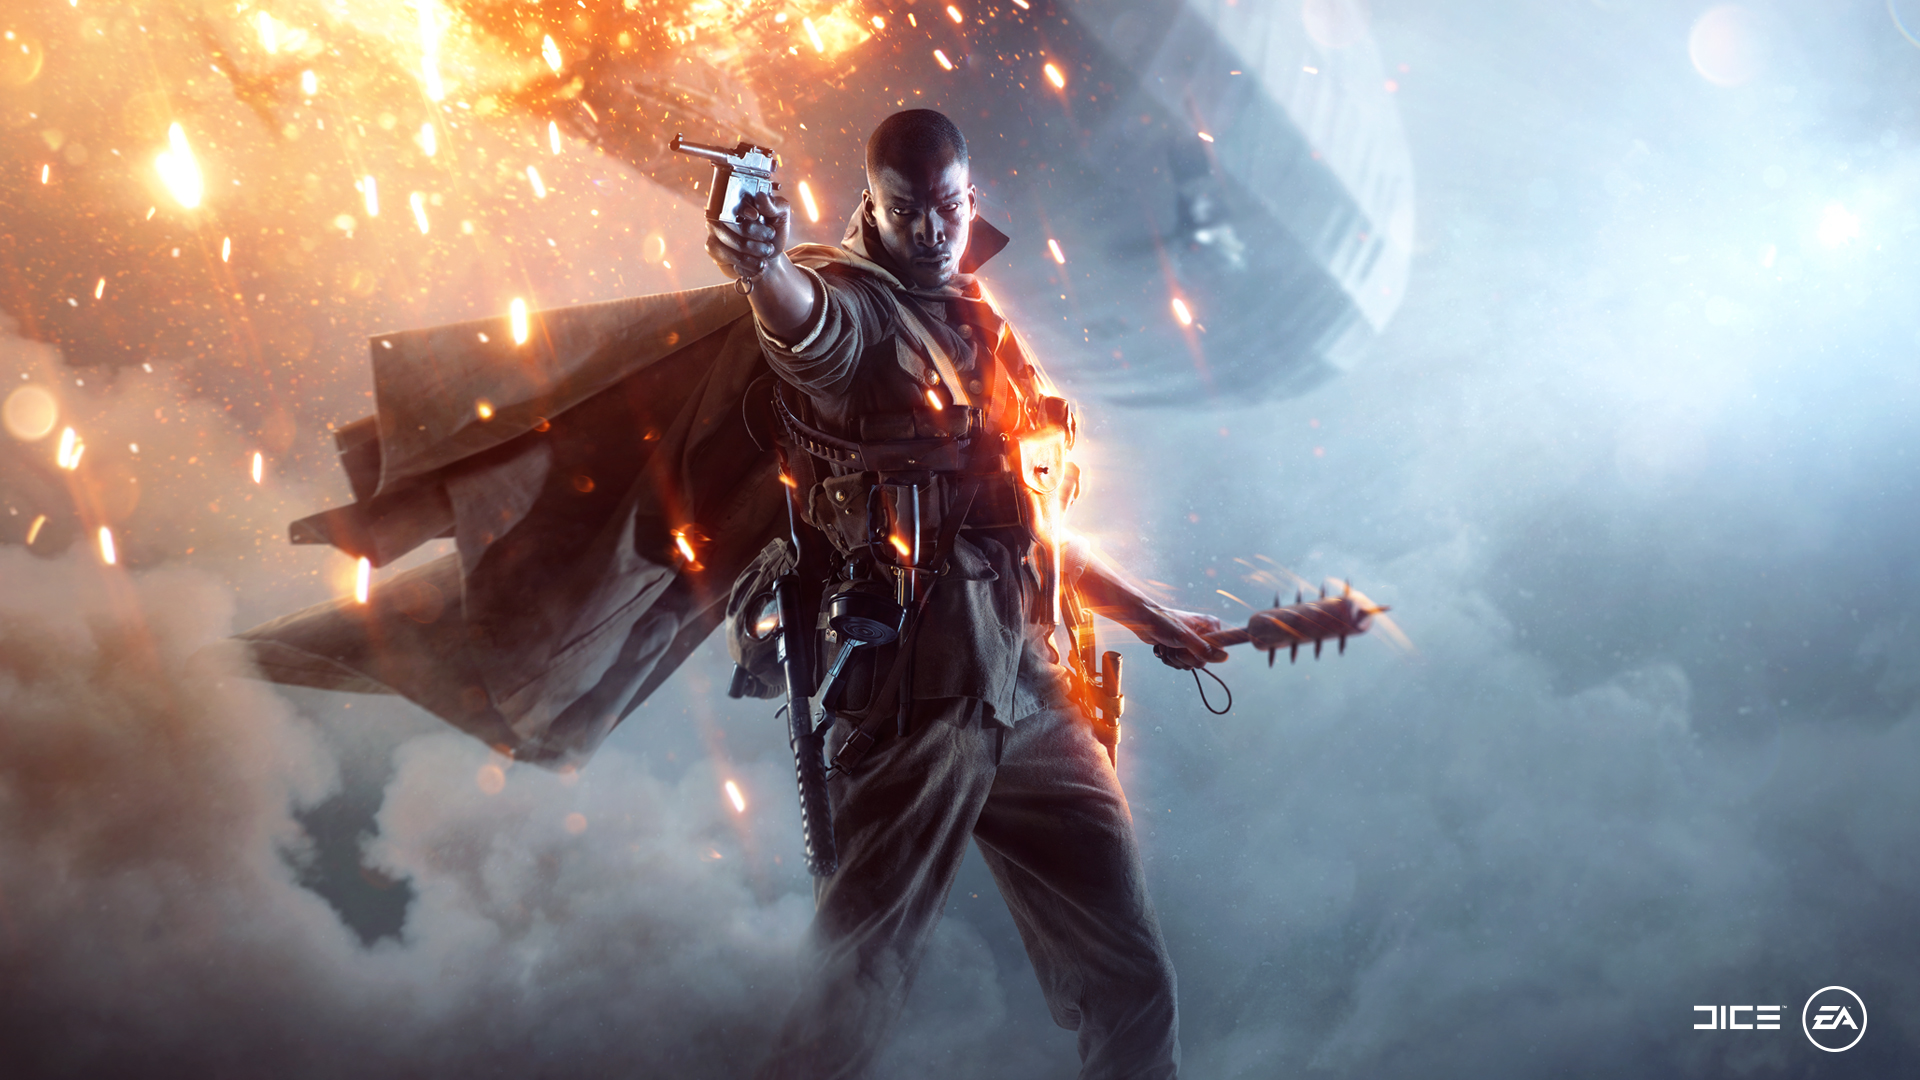 Fondos De Pantalla De Battlefield 1 Para La PC, Celulares